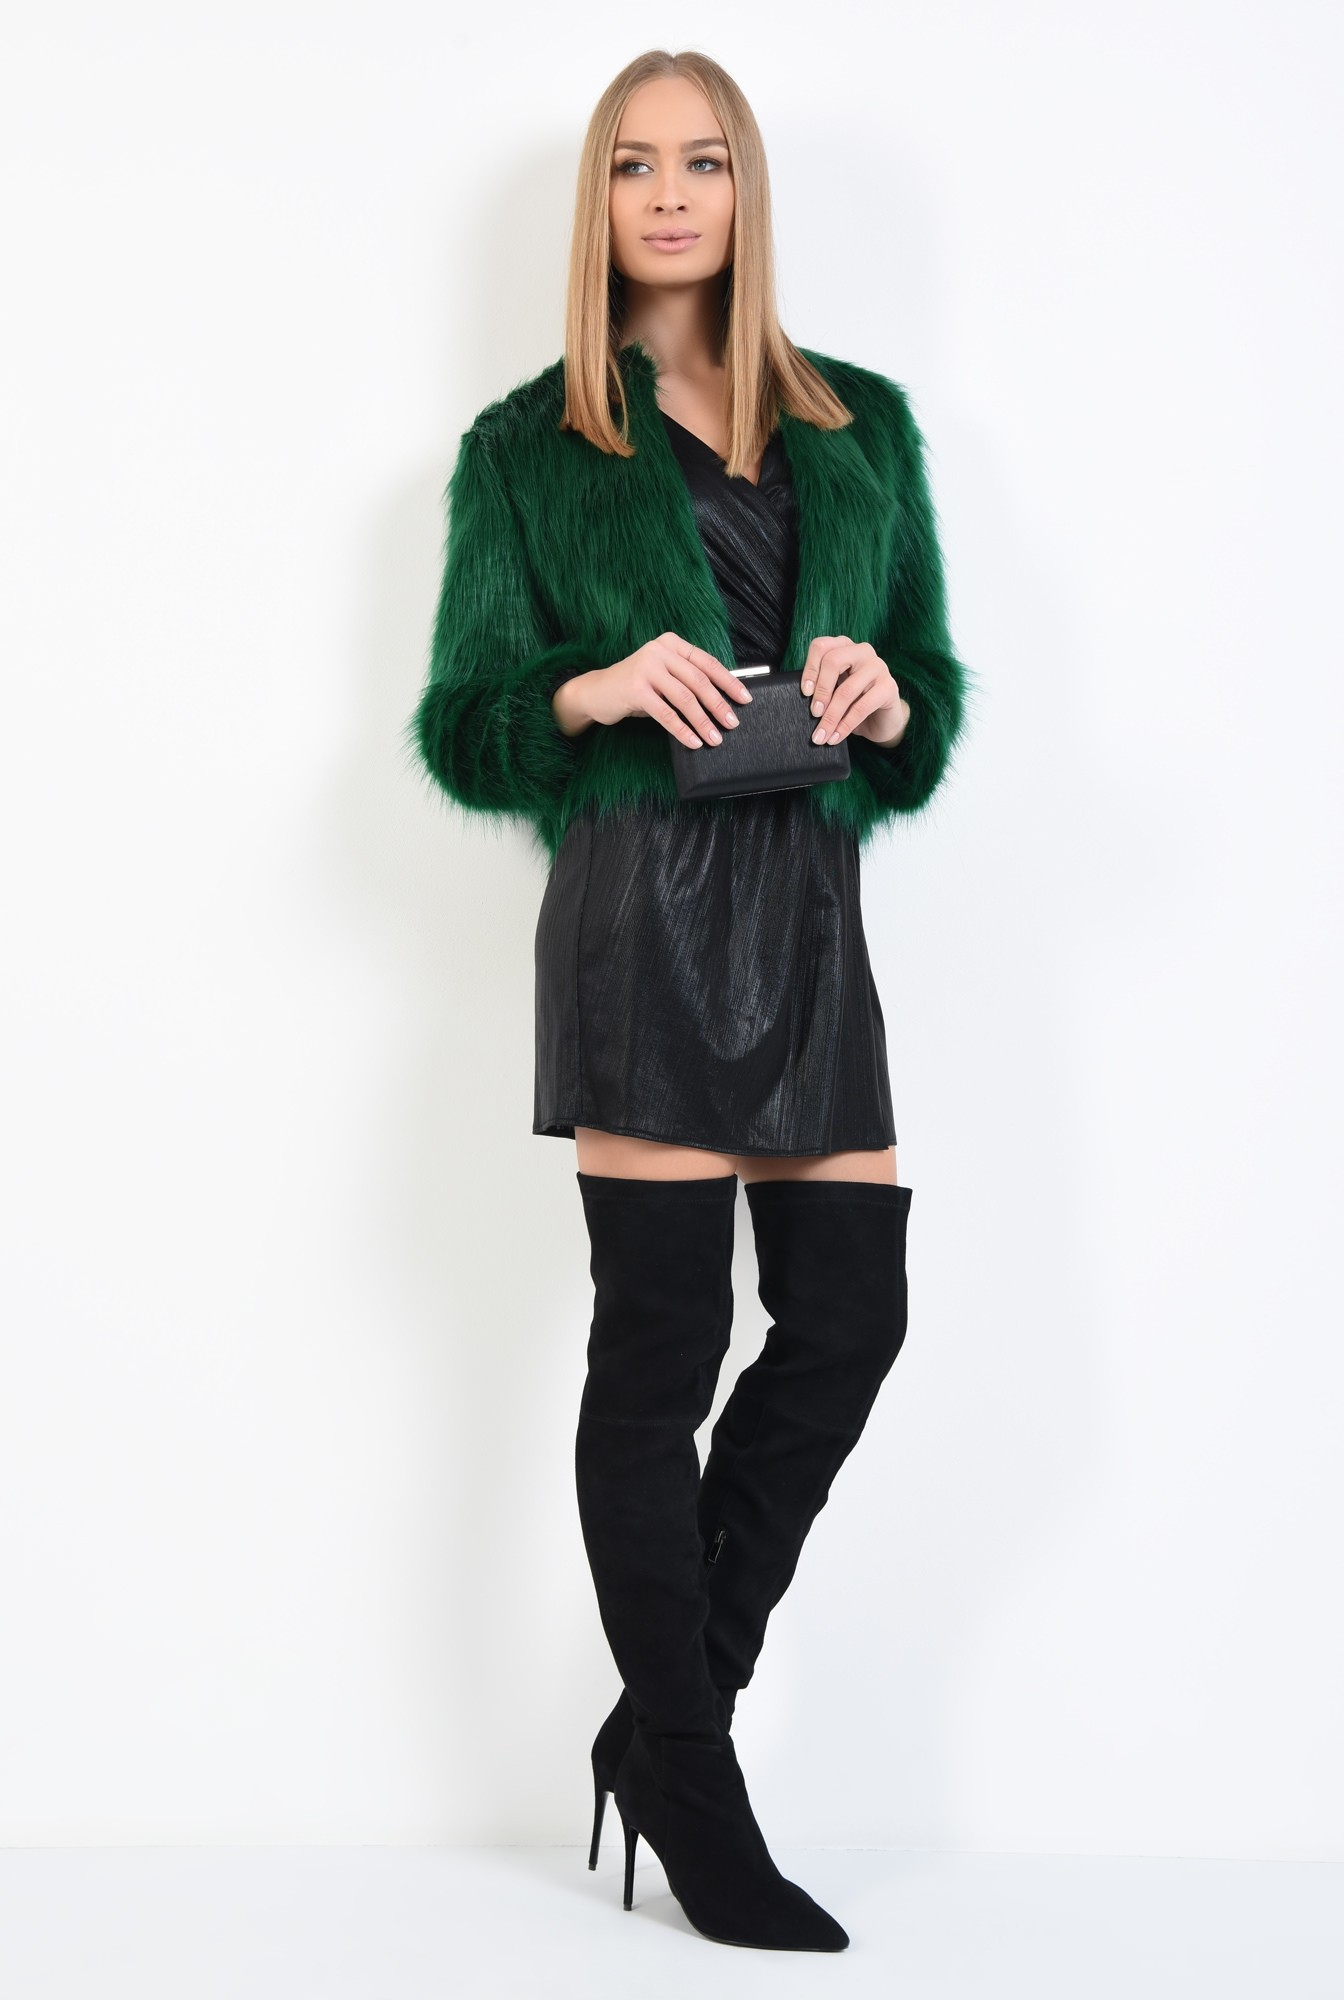 0 - jacheta verde, blana artificiala, maneci lungi